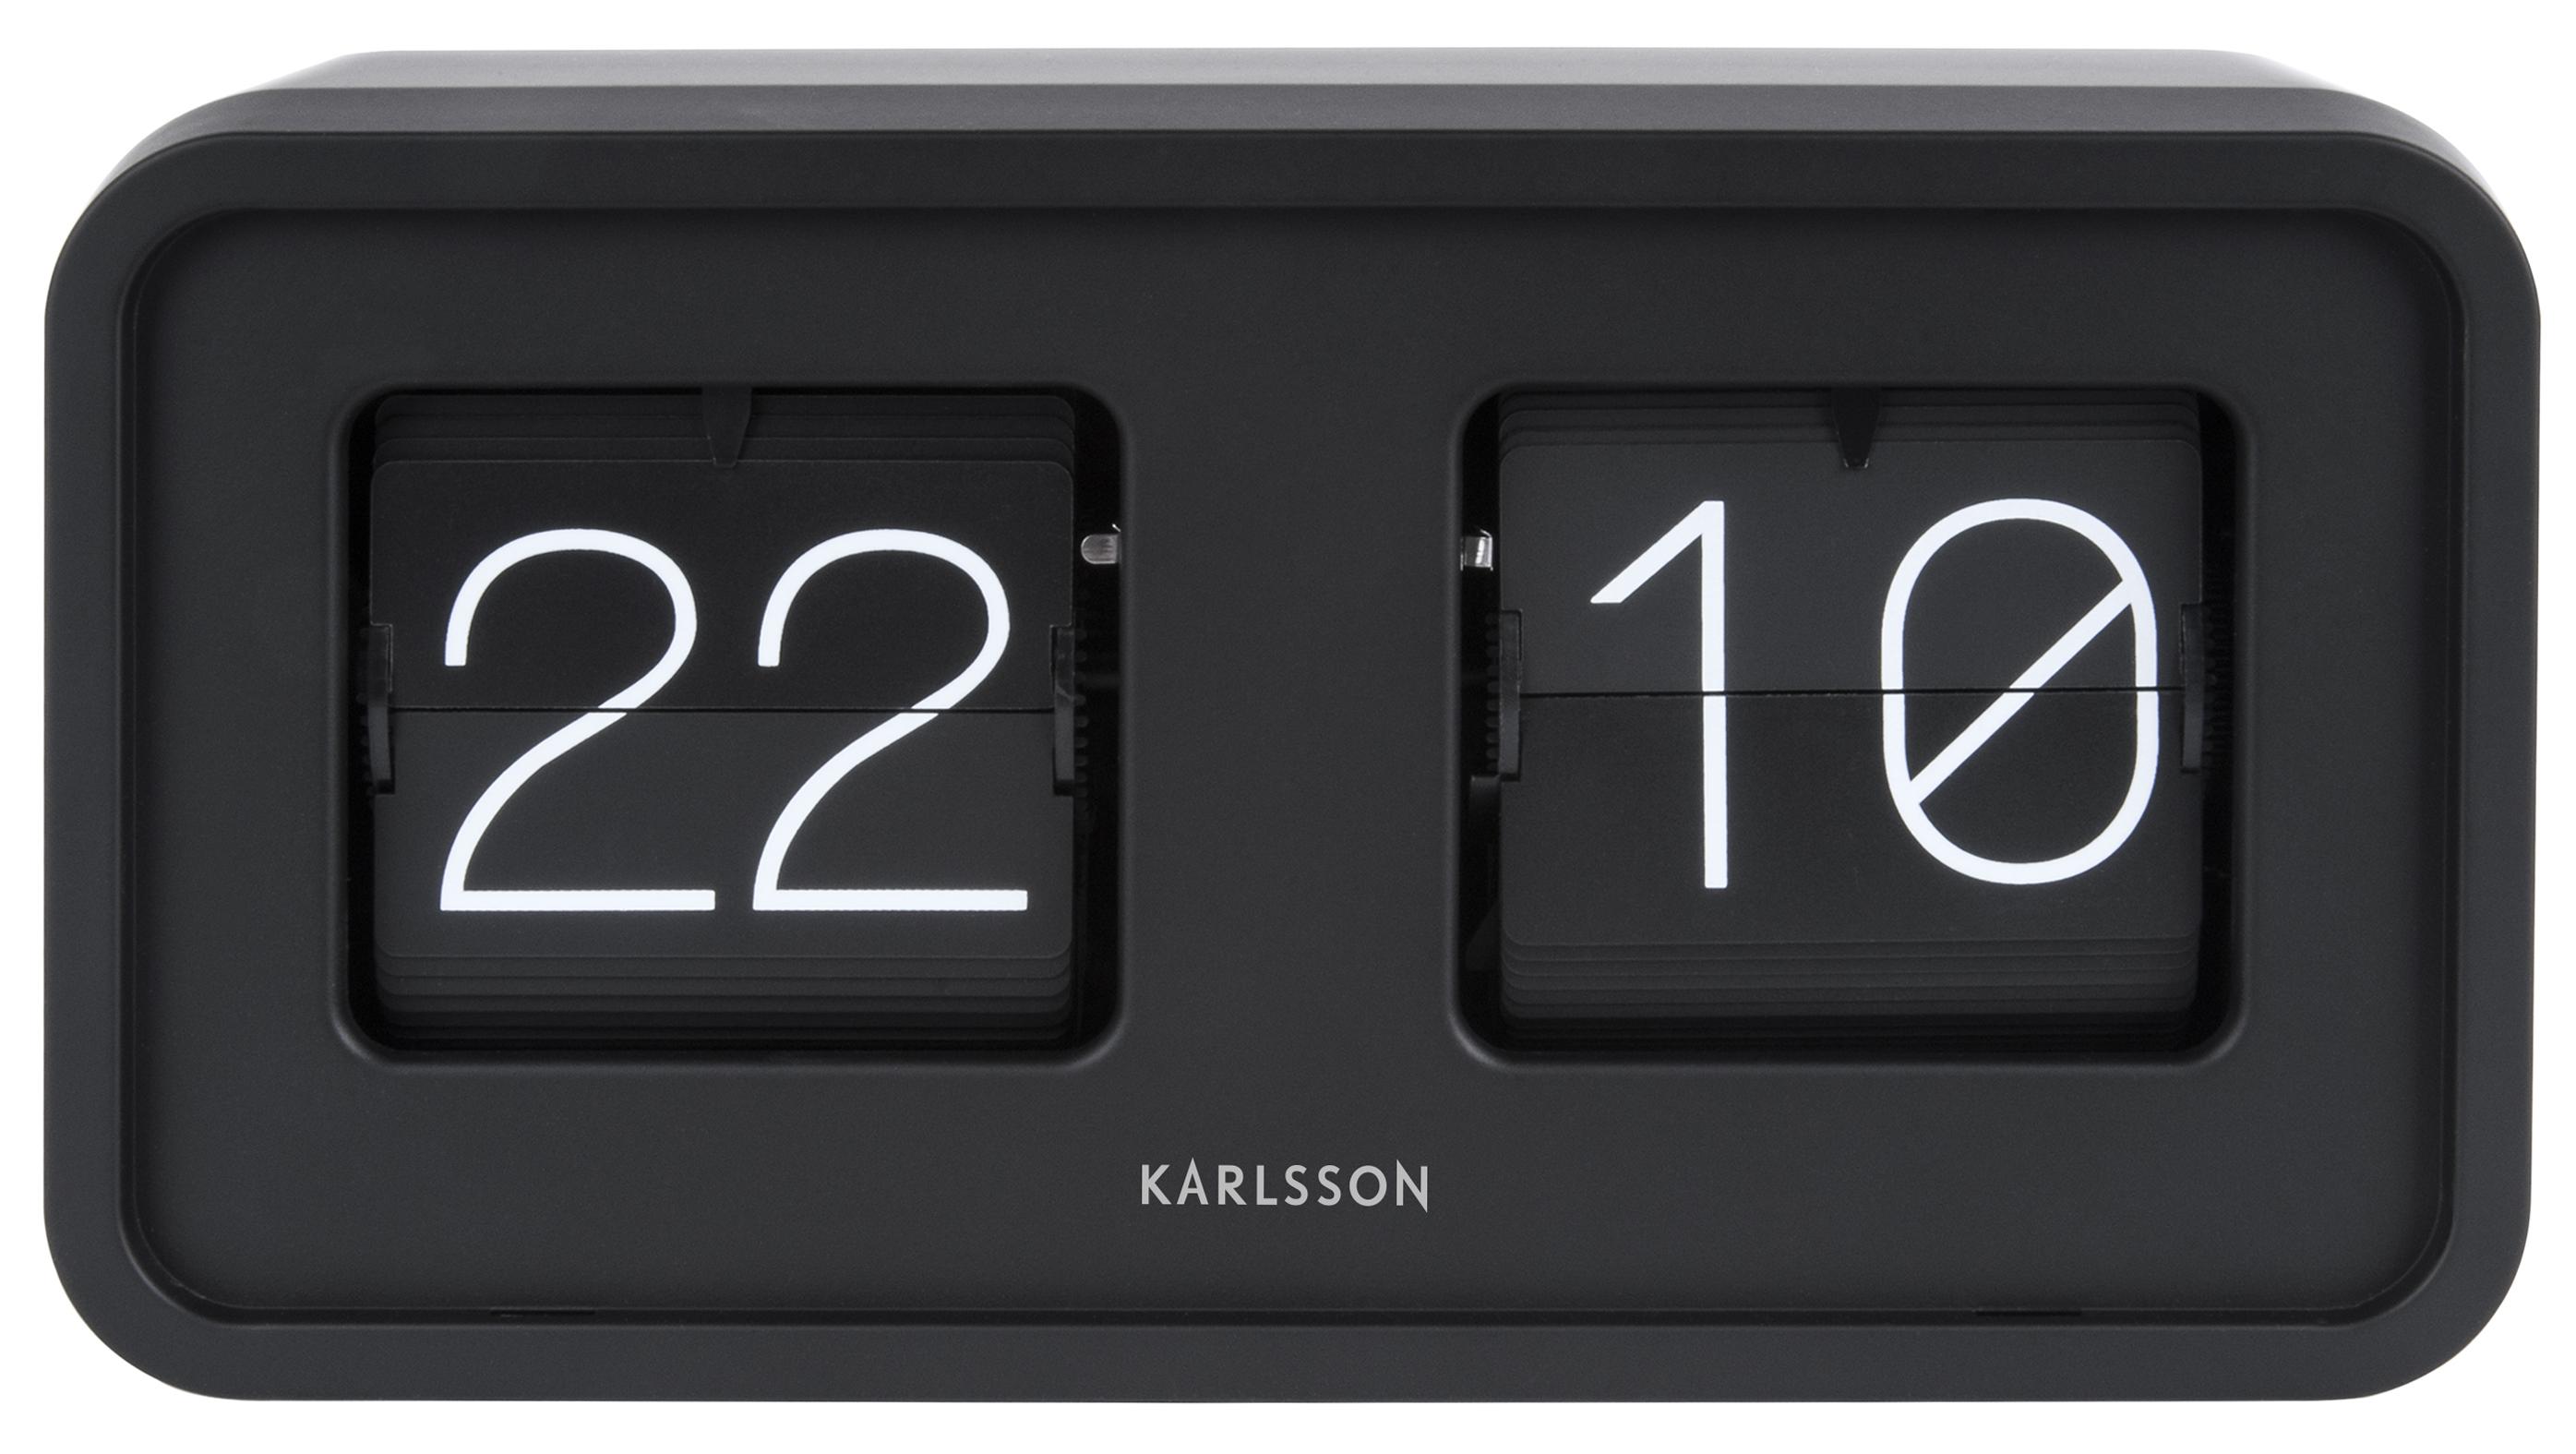 wanduhr tischuhr karlsson bold flip ka5712bk g nstig auf. Black Bedroom Furniture Sets. Home Design Ideas